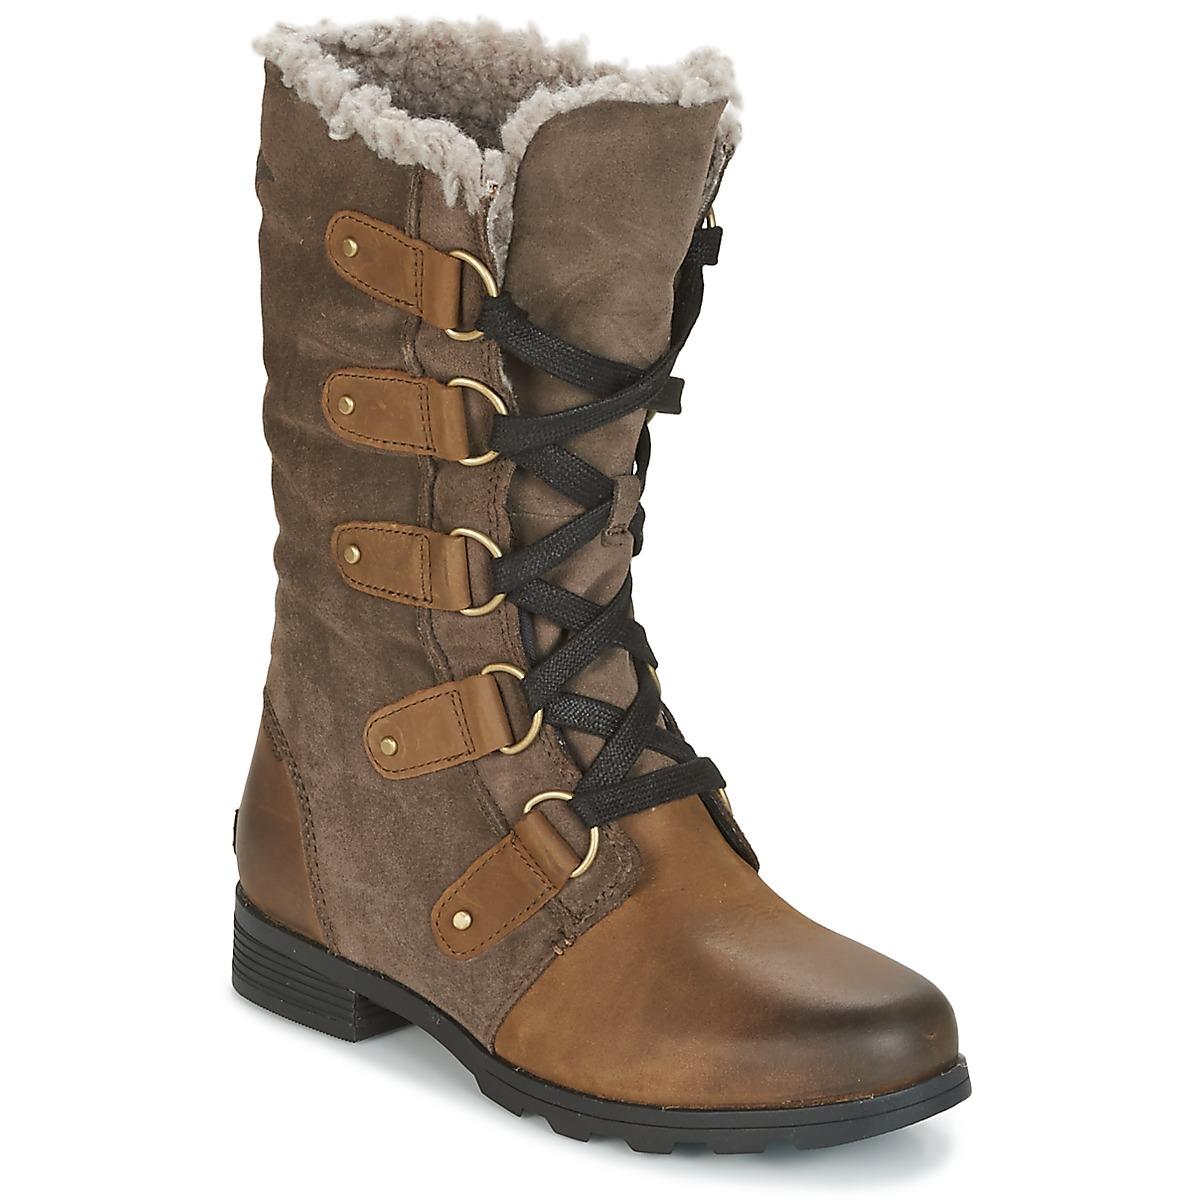 Chaussures Sorel femme CijxcNm